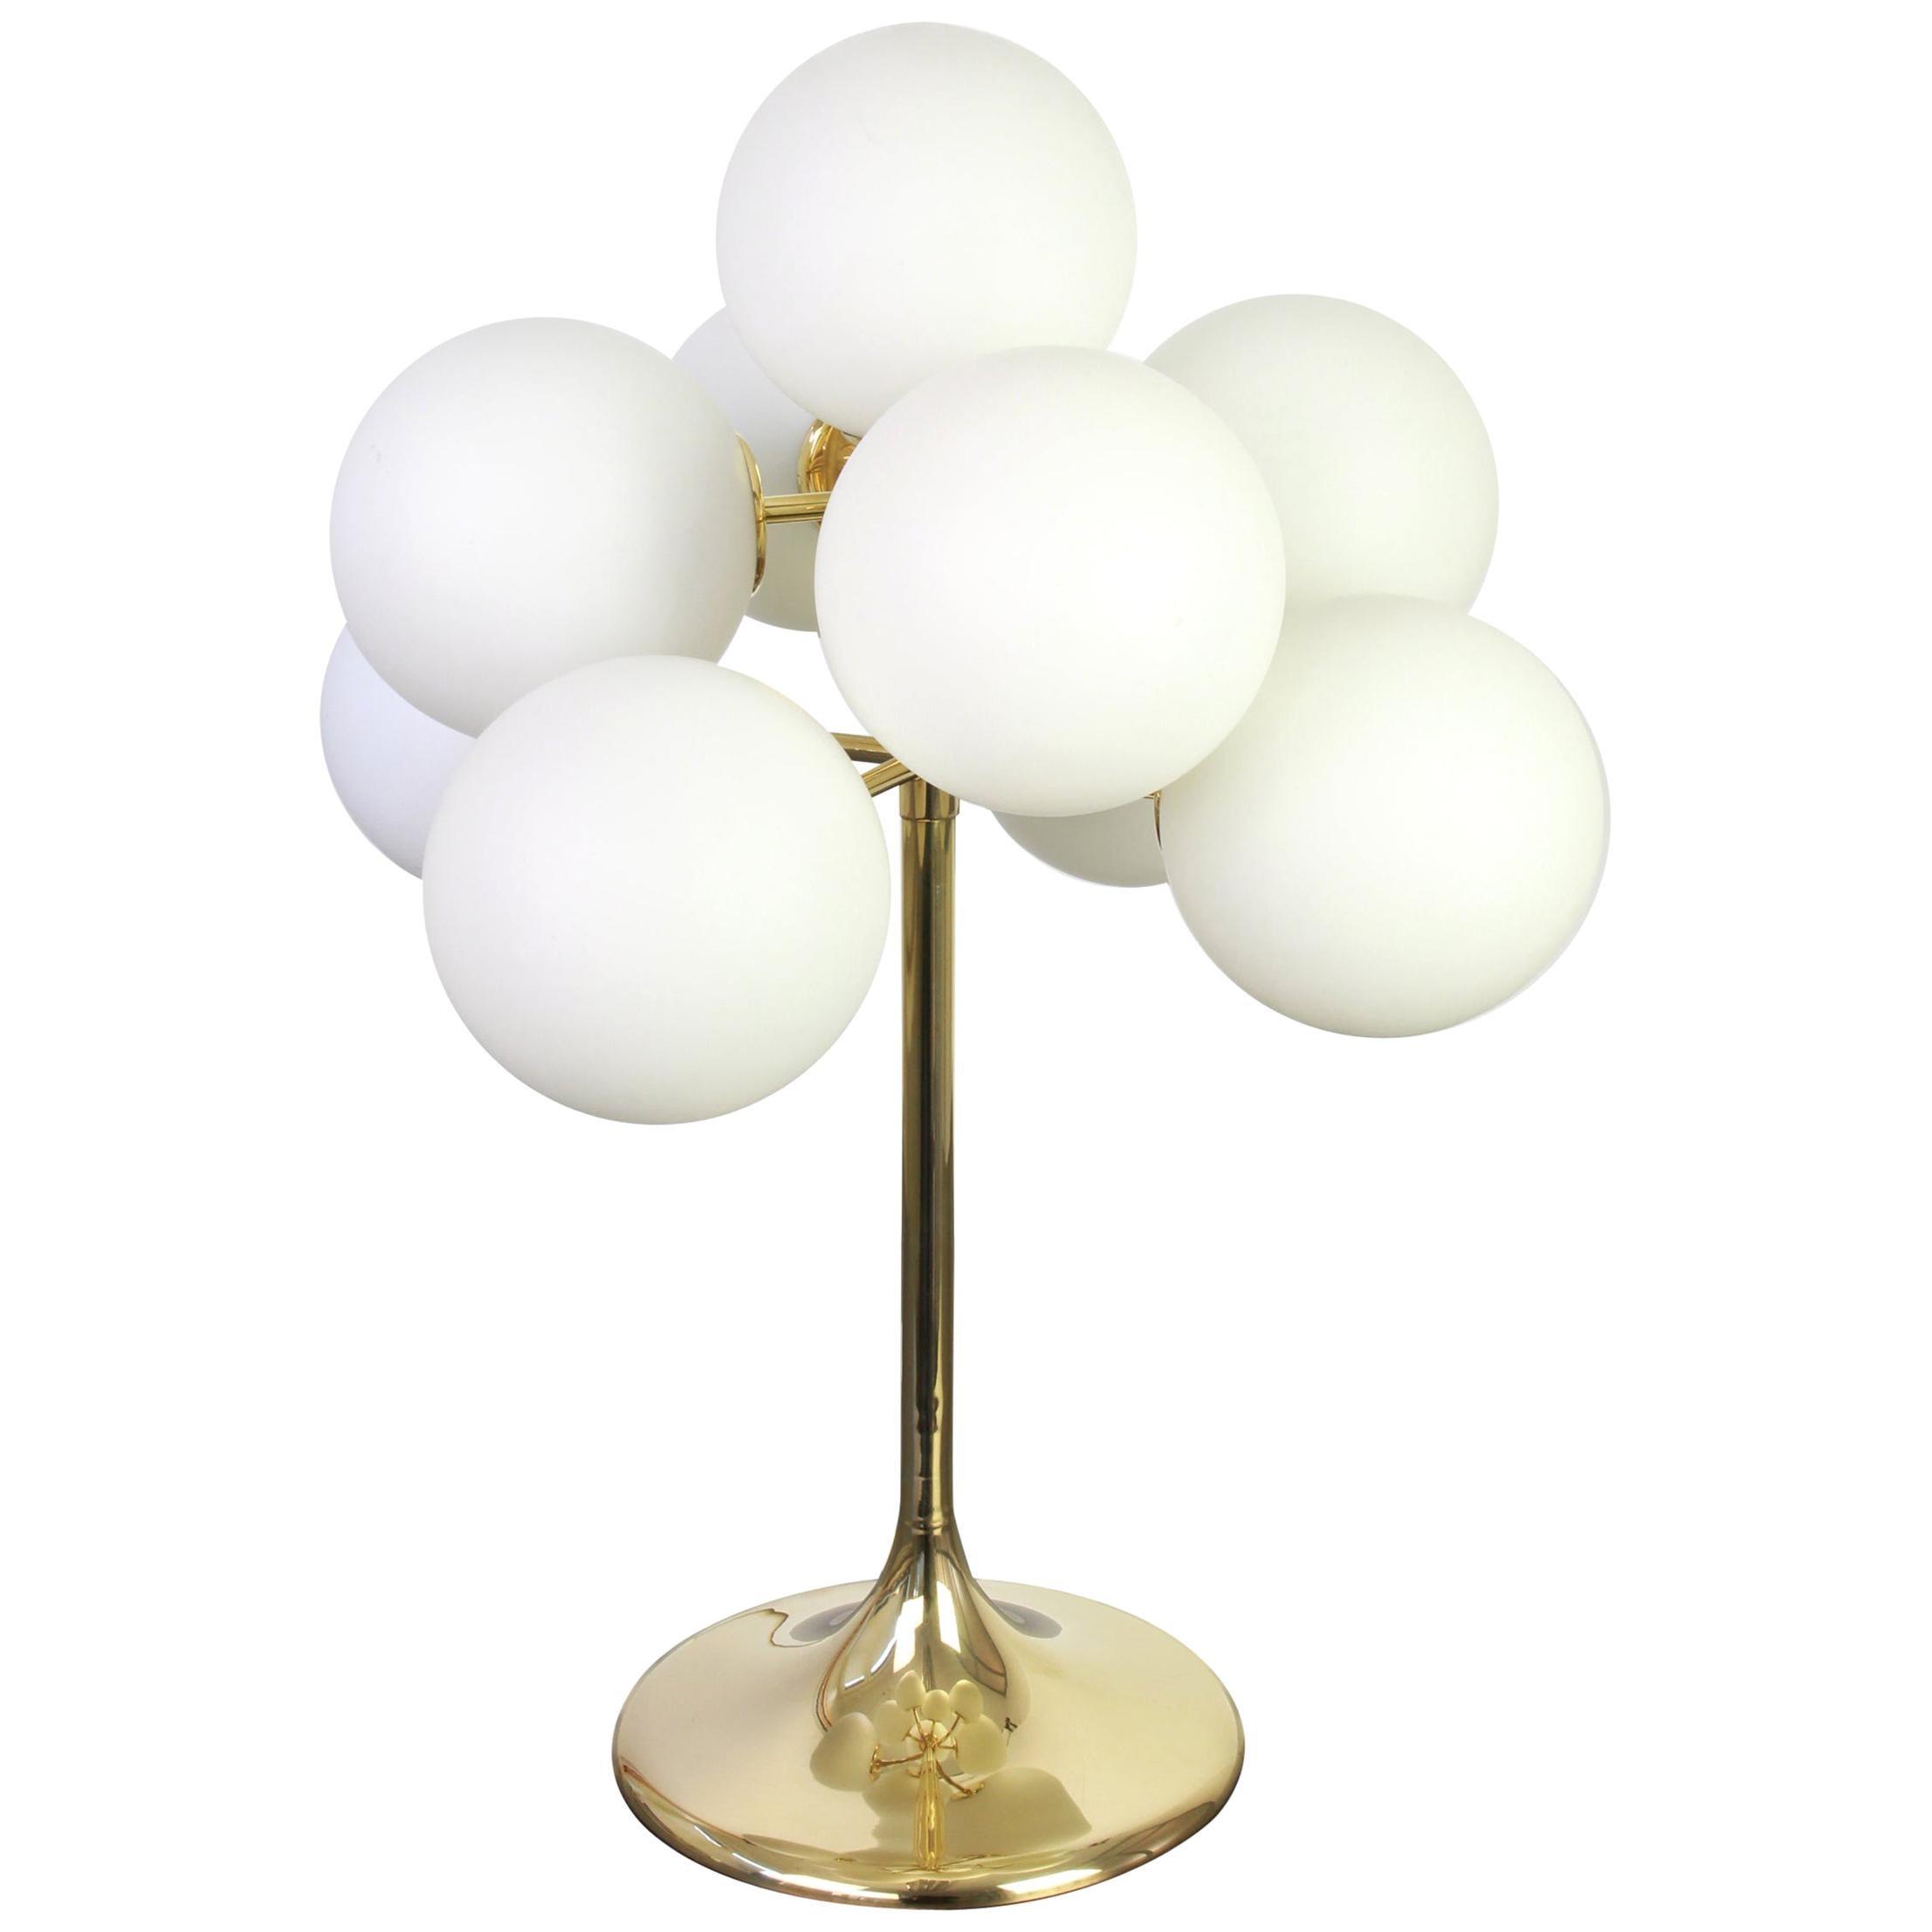 Atomic Brass Table Lamp, Switzerland, 1960s